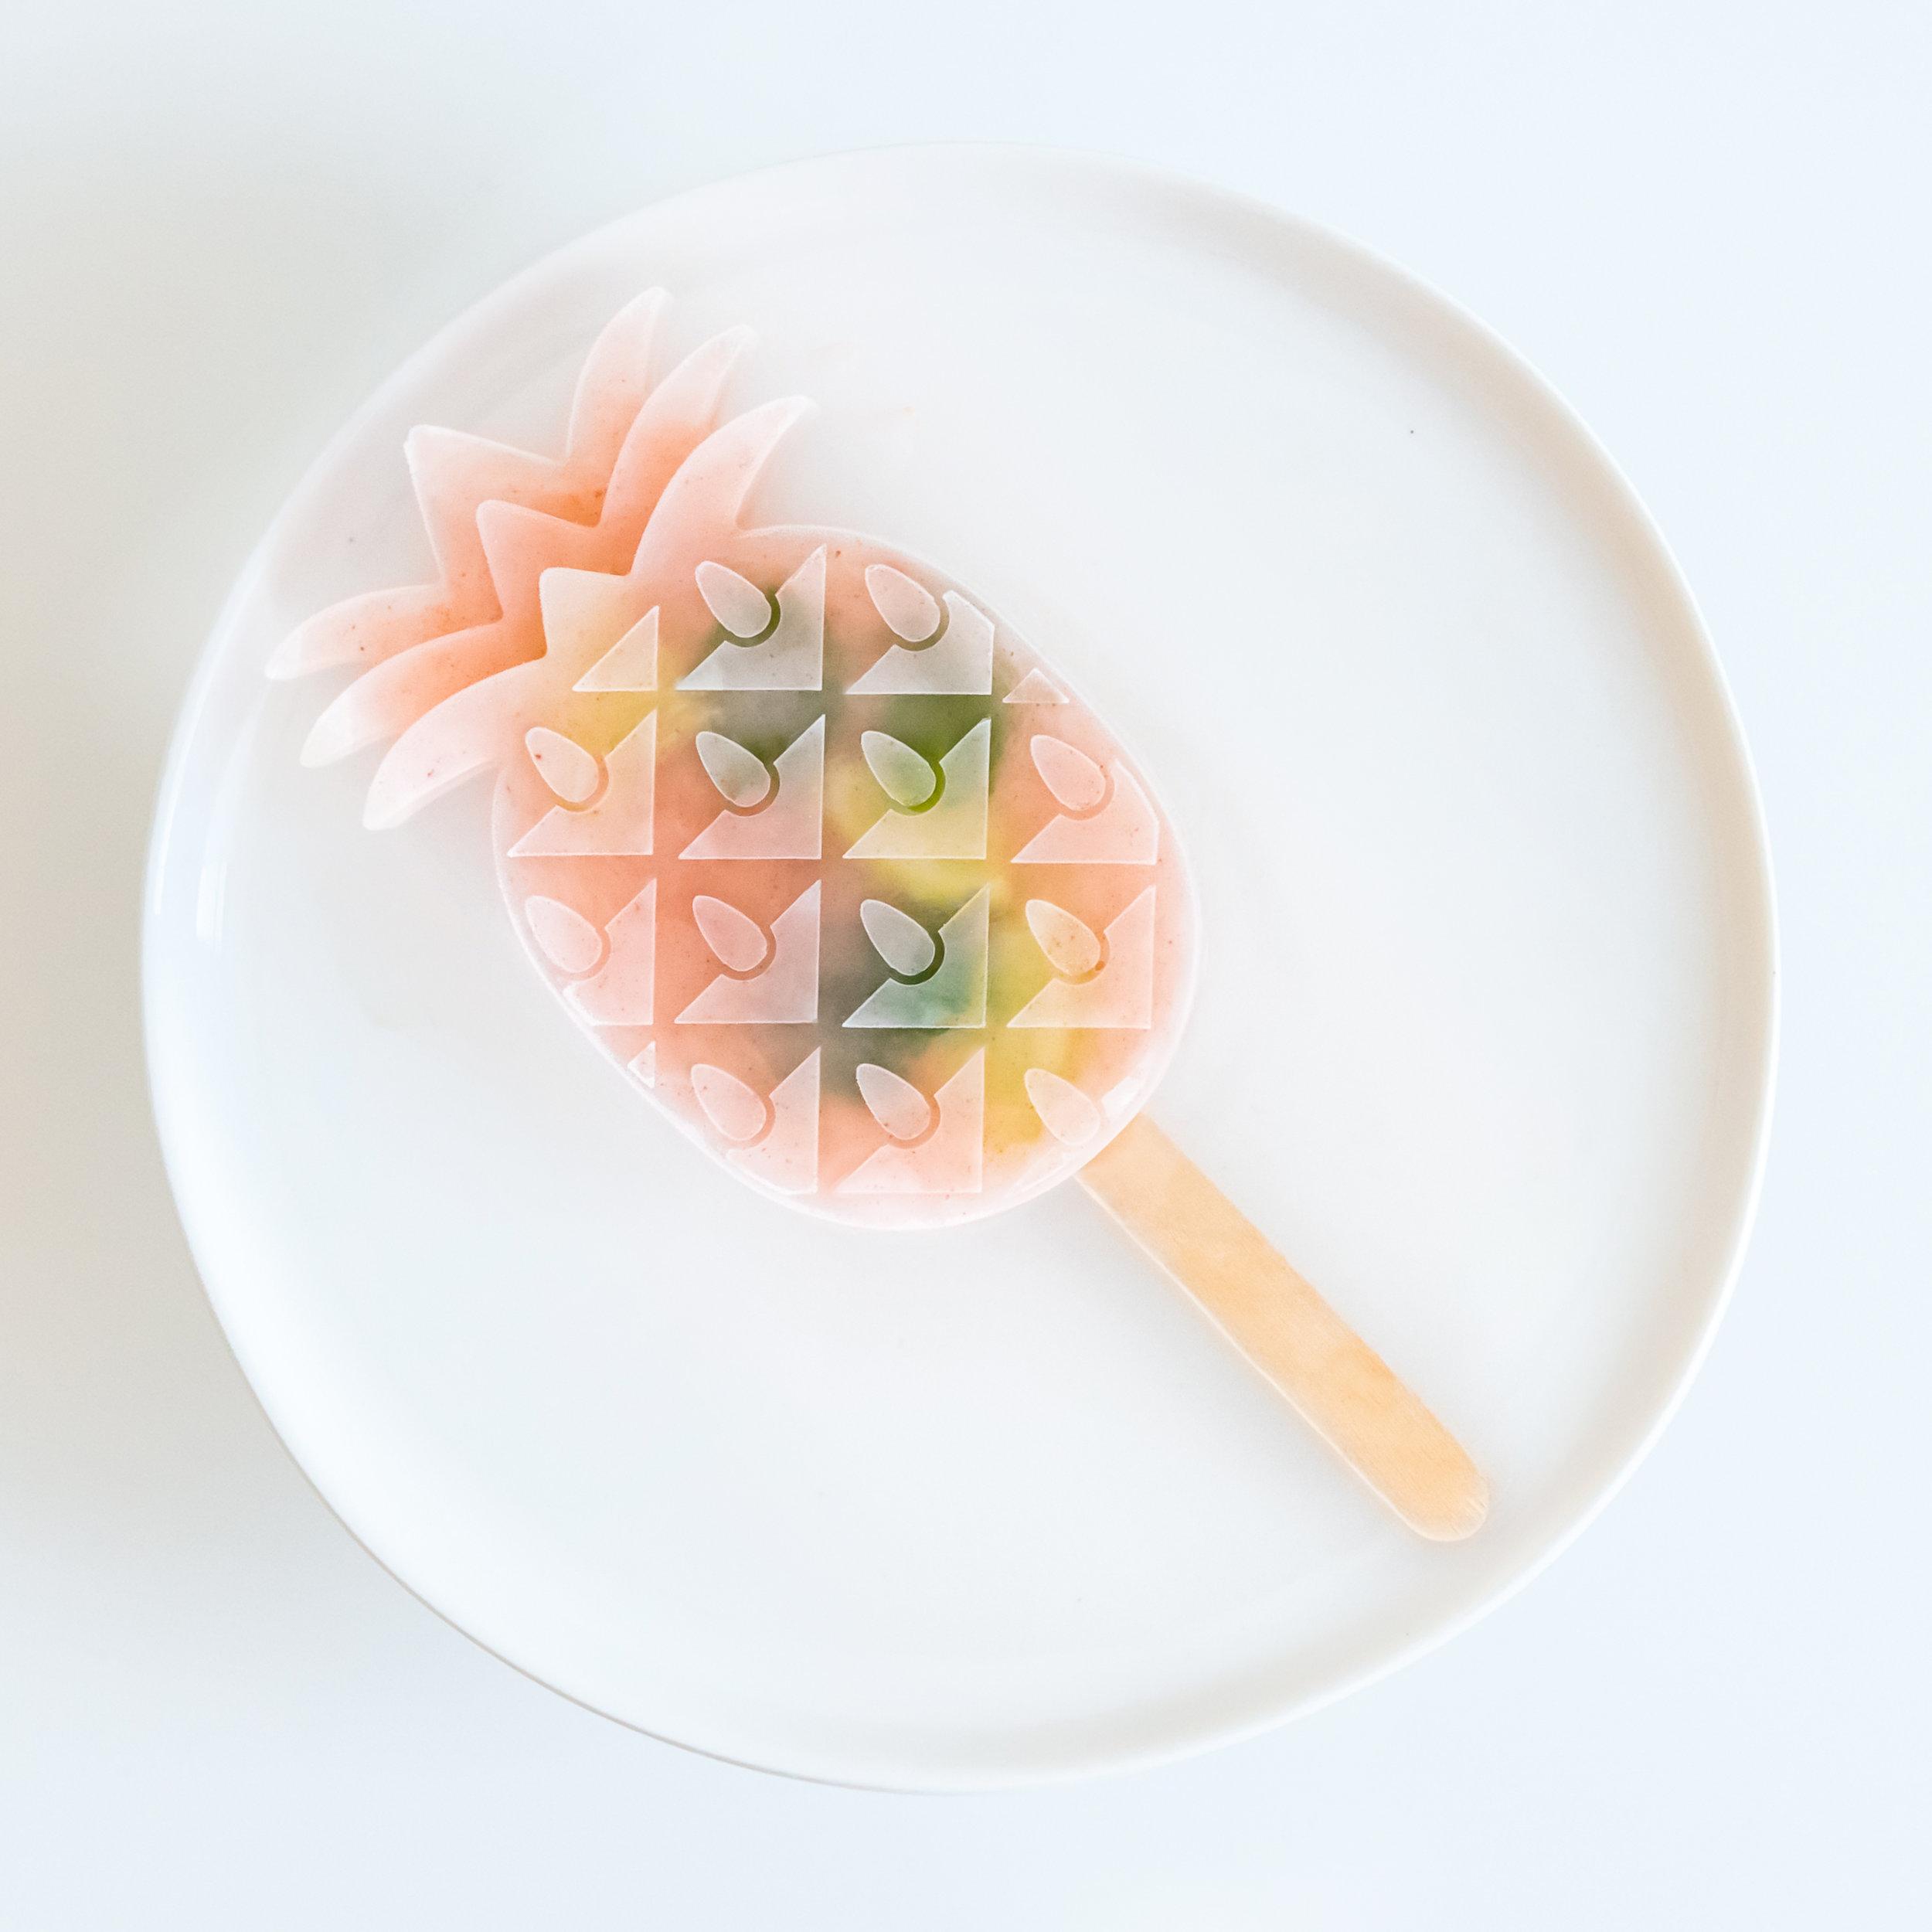 Watermelon, Mint + Gin Icy Pole (Four Pillars)